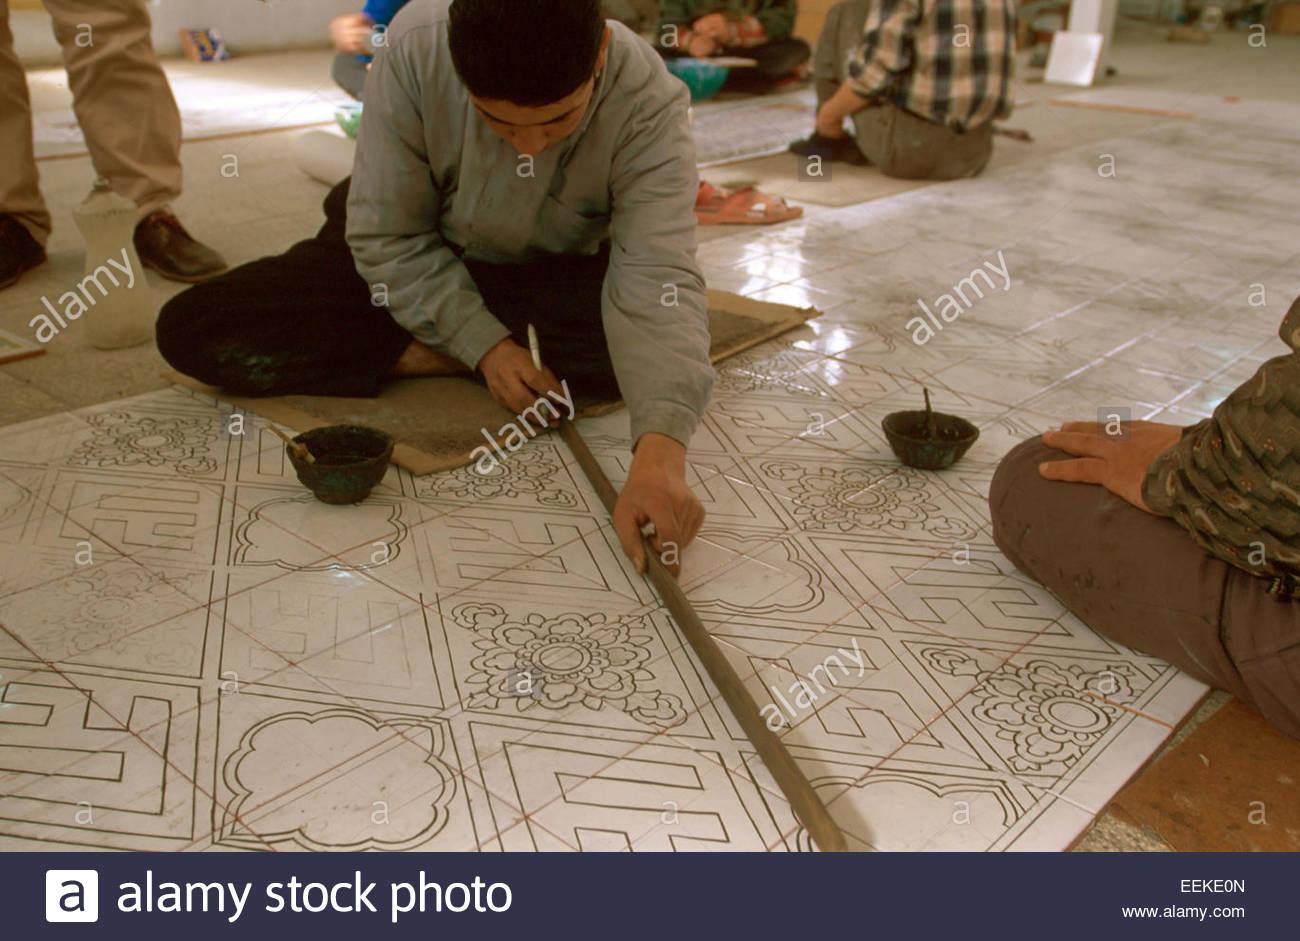 Iran, Ispahan, ceramics and crockery workshop - Stock Image